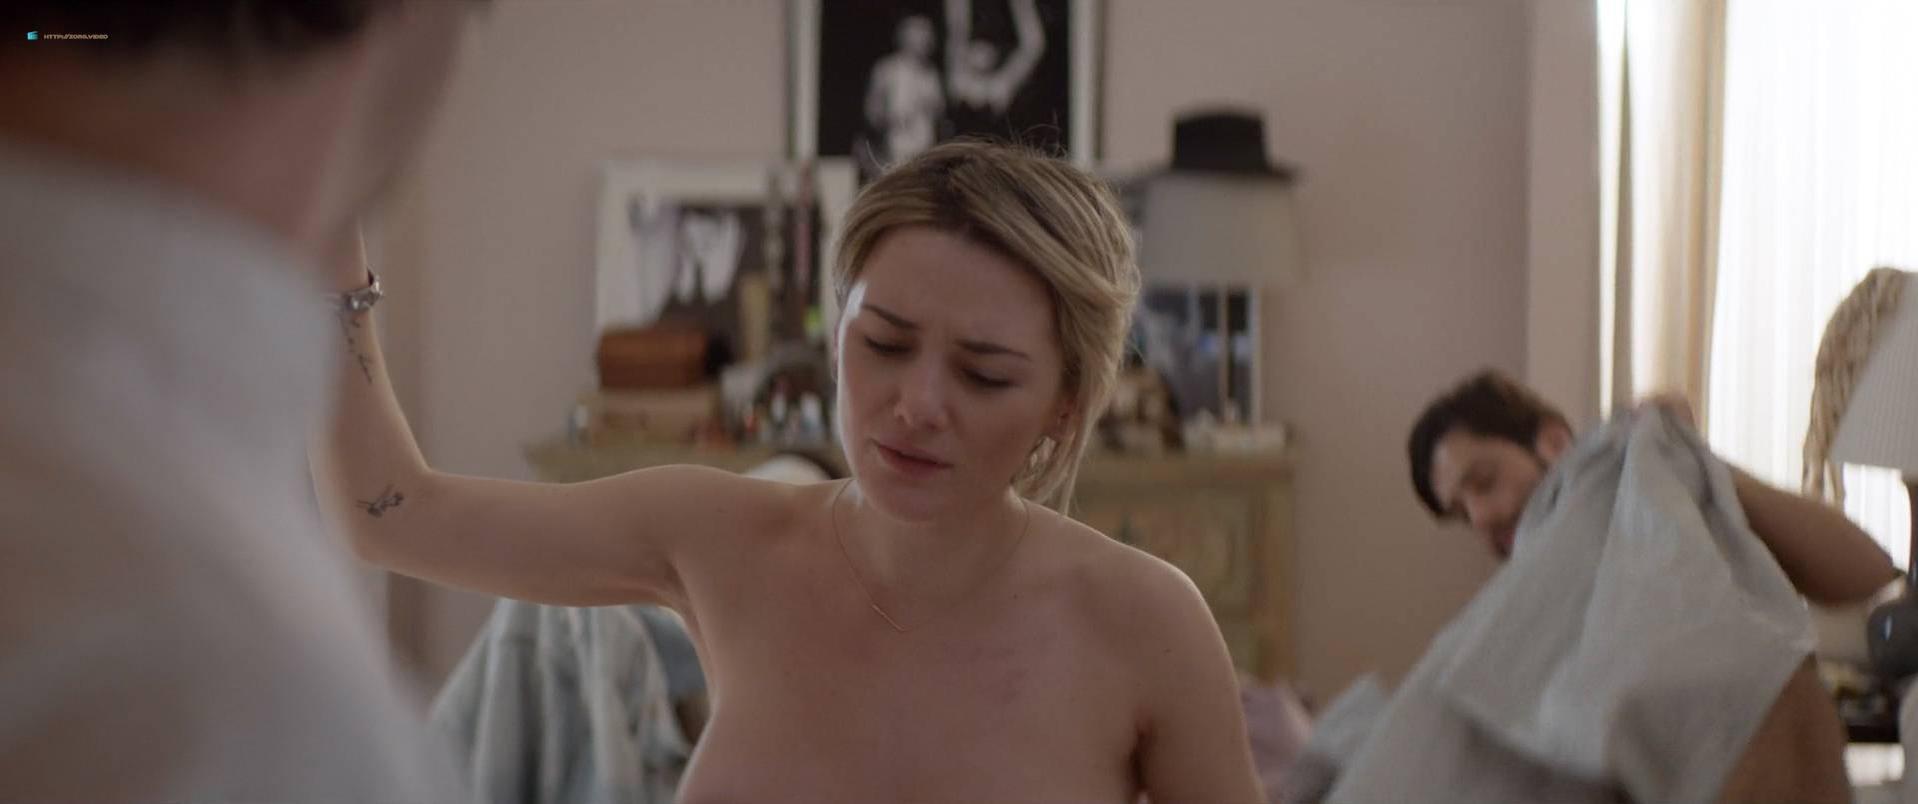 nude video celebs » ashley benson sexy, addison timlin sexy